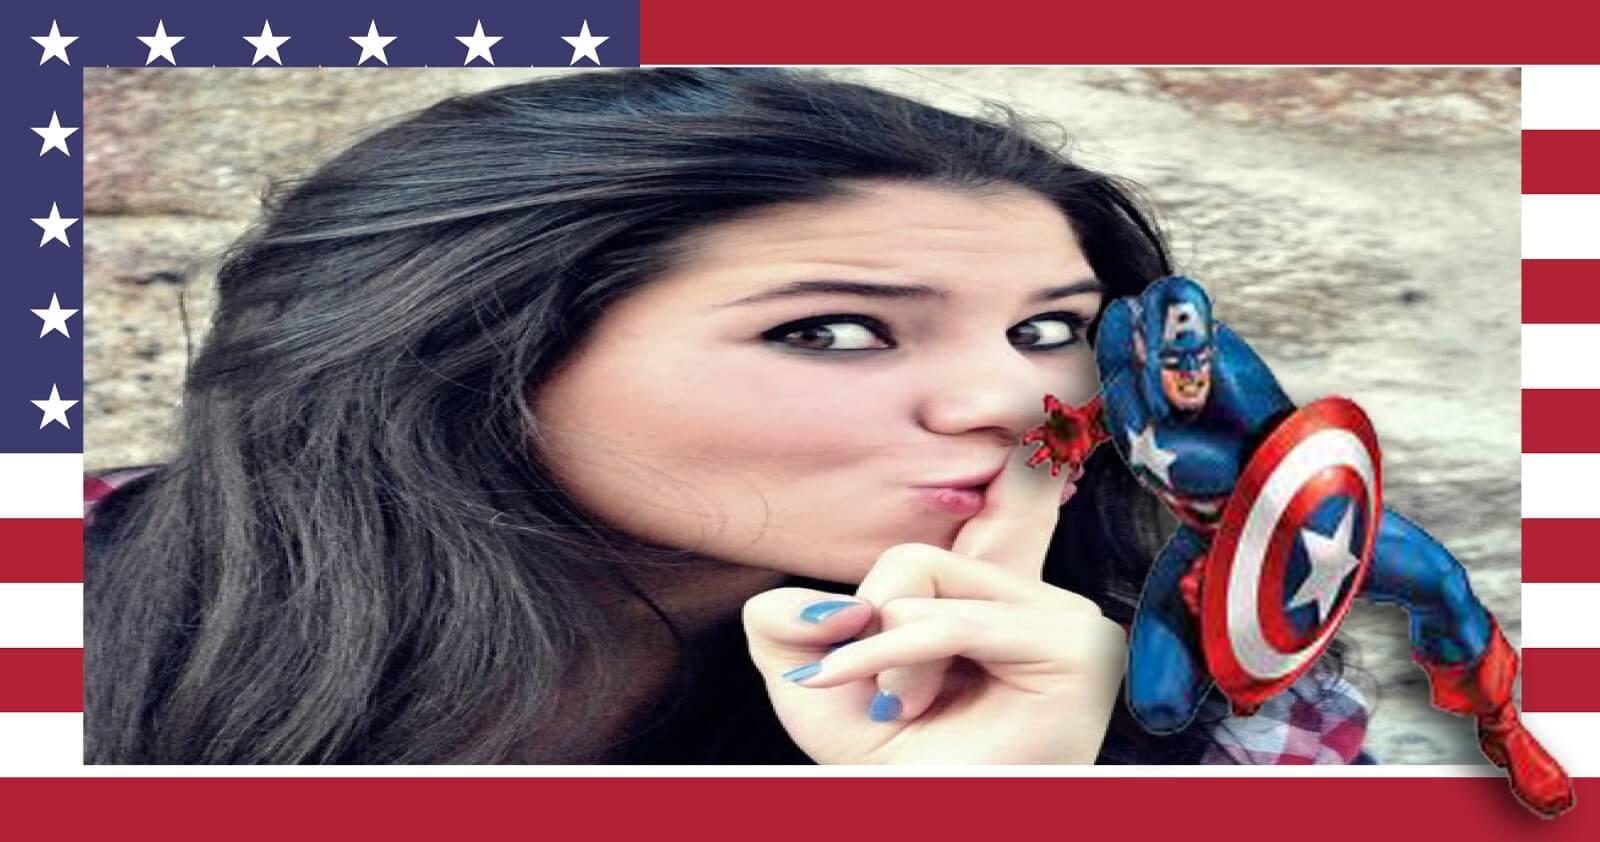 molduras-gratis-capitao-america